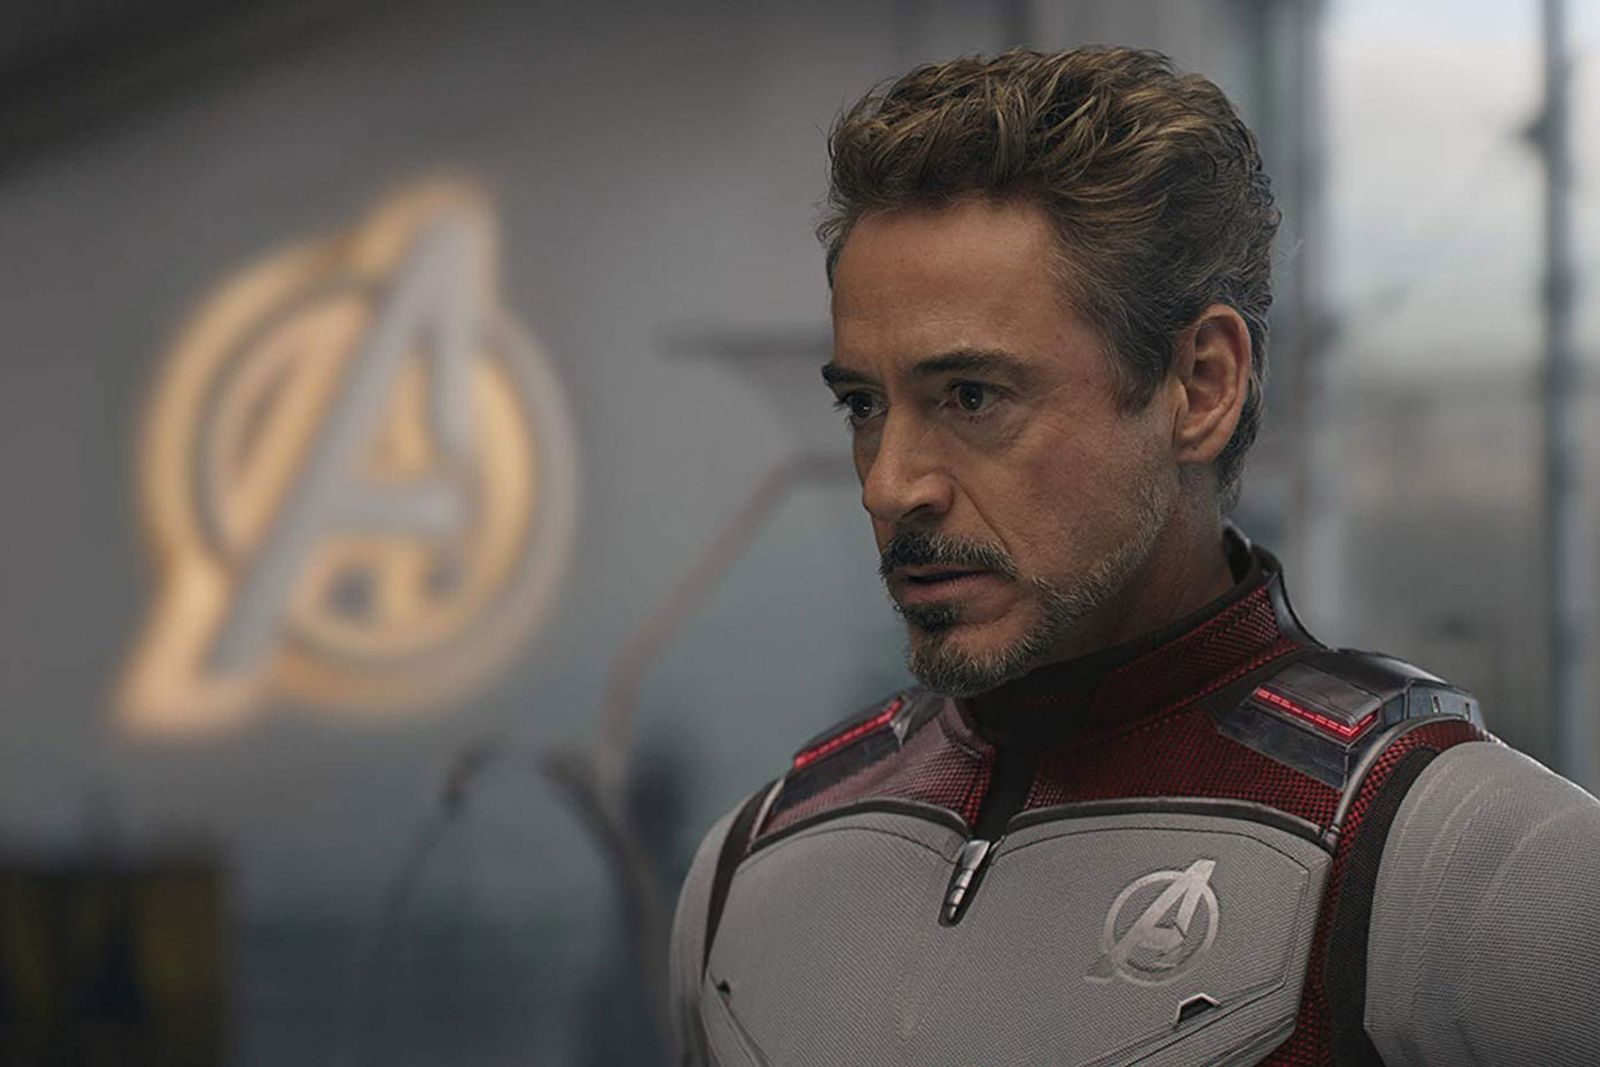 Iron Man in Marvel's 'Endgame'